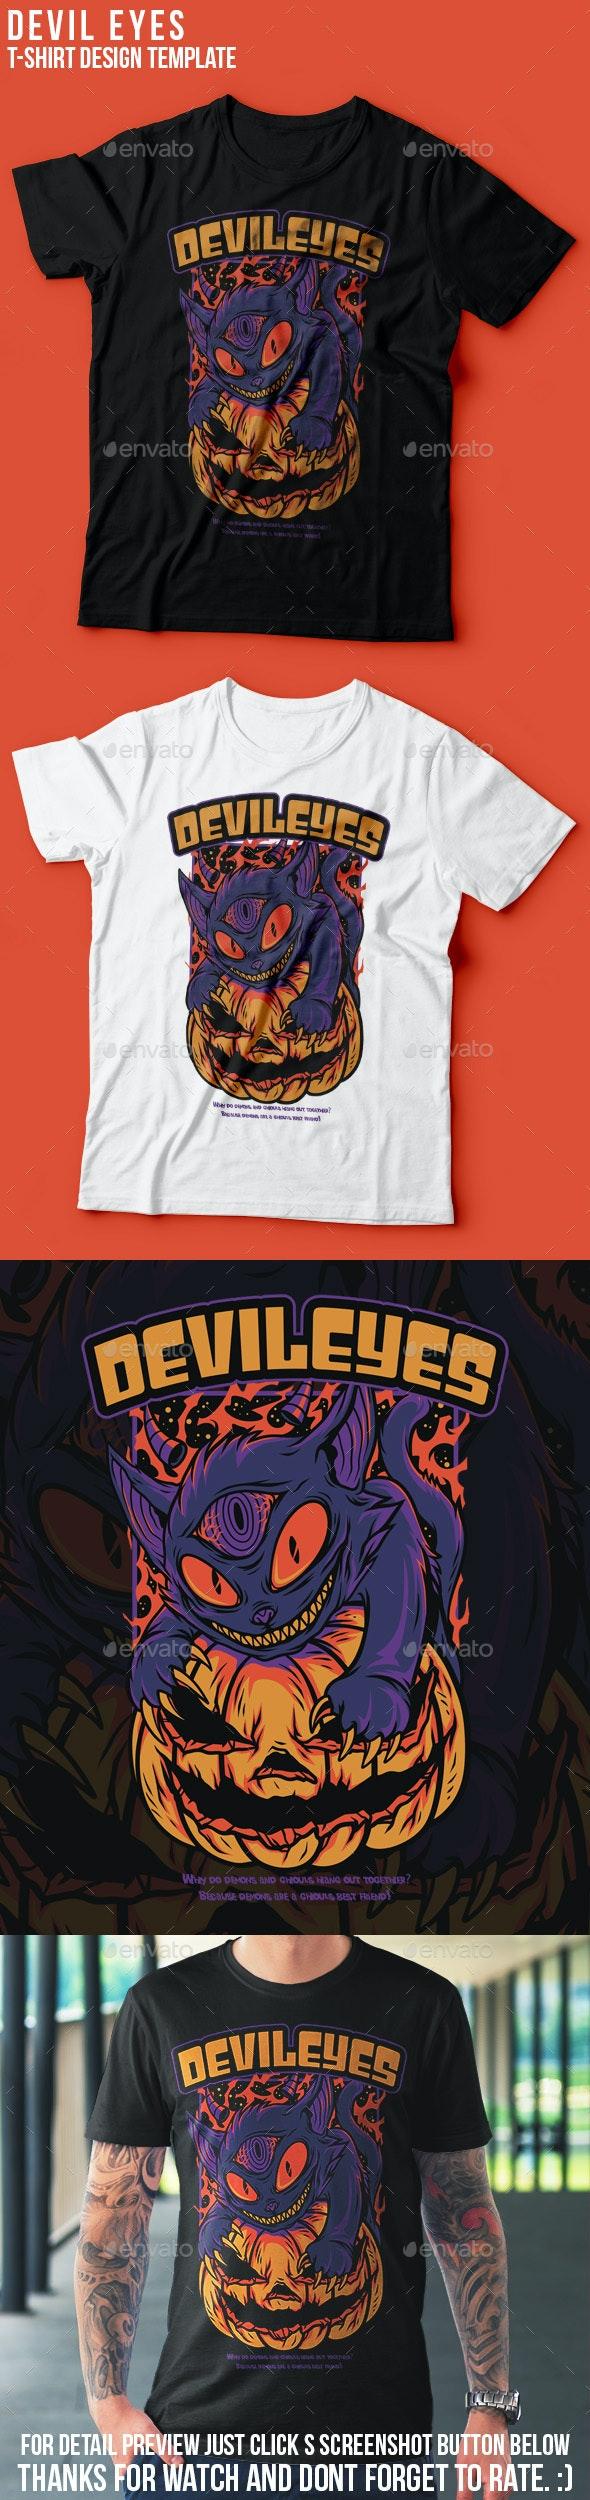 Devil Eyes Halloween T-Shirt Design - Clean Designs